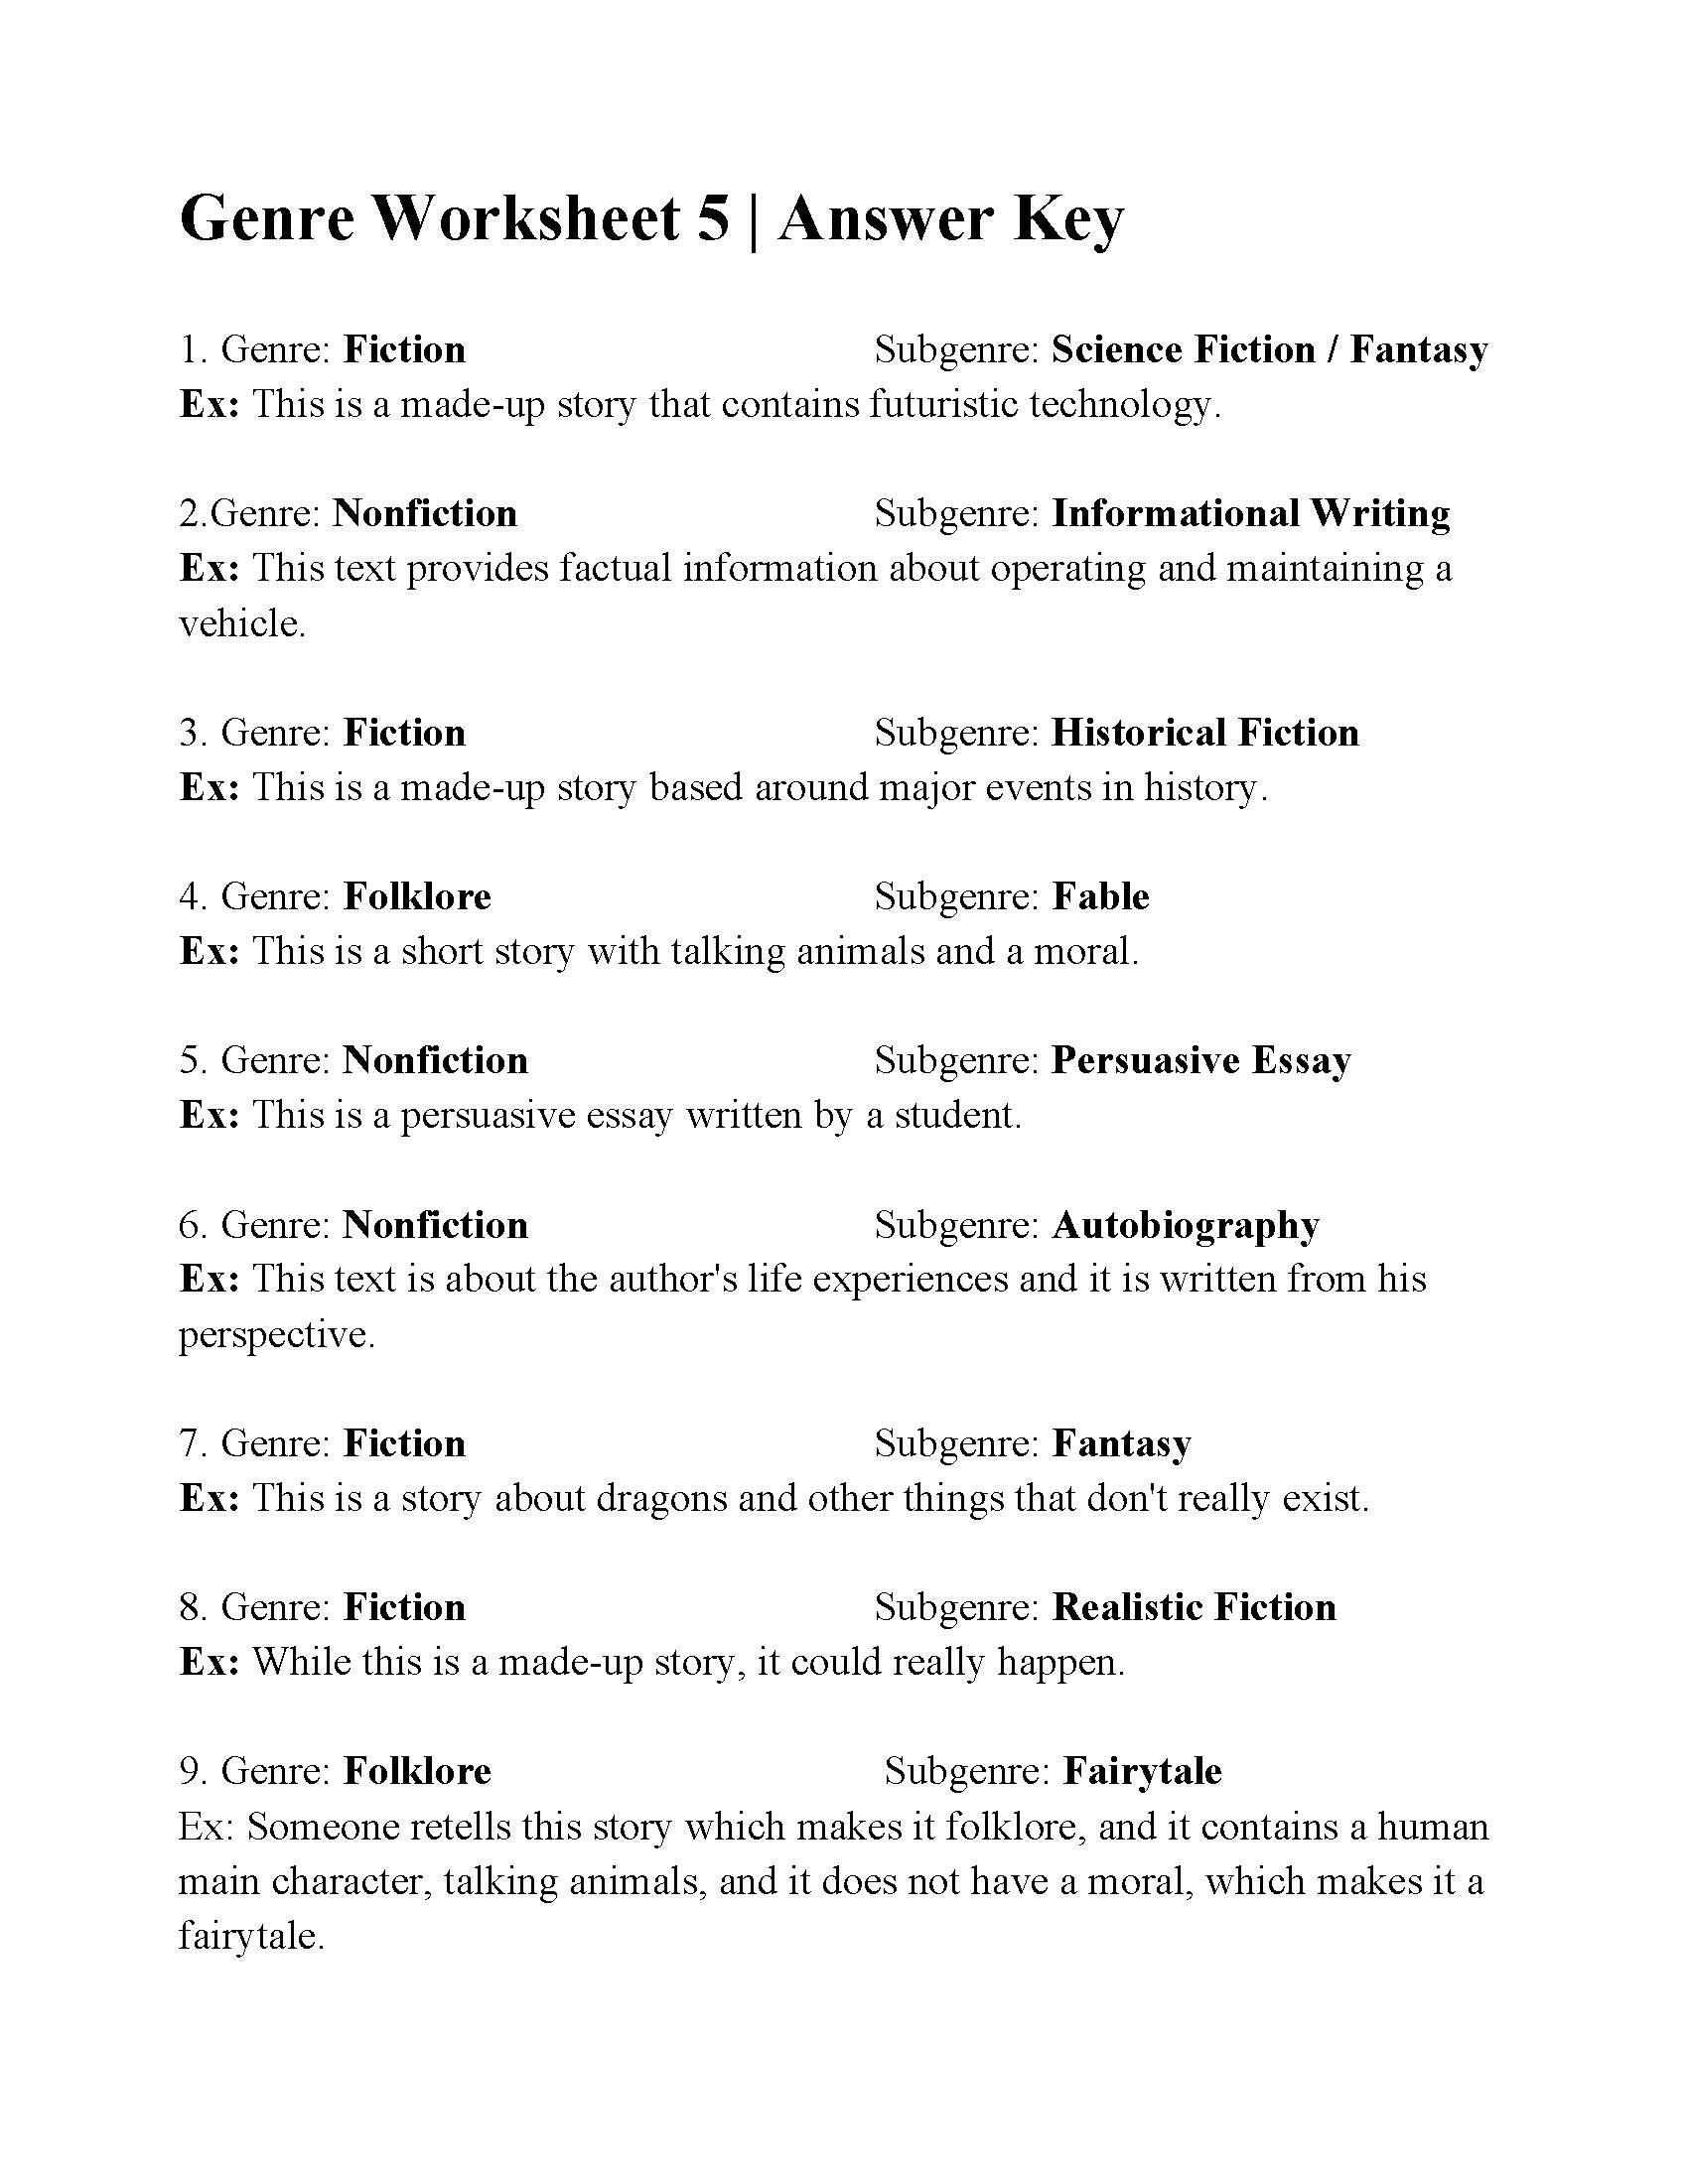 Identifying Genre And Subgenre Worksheet